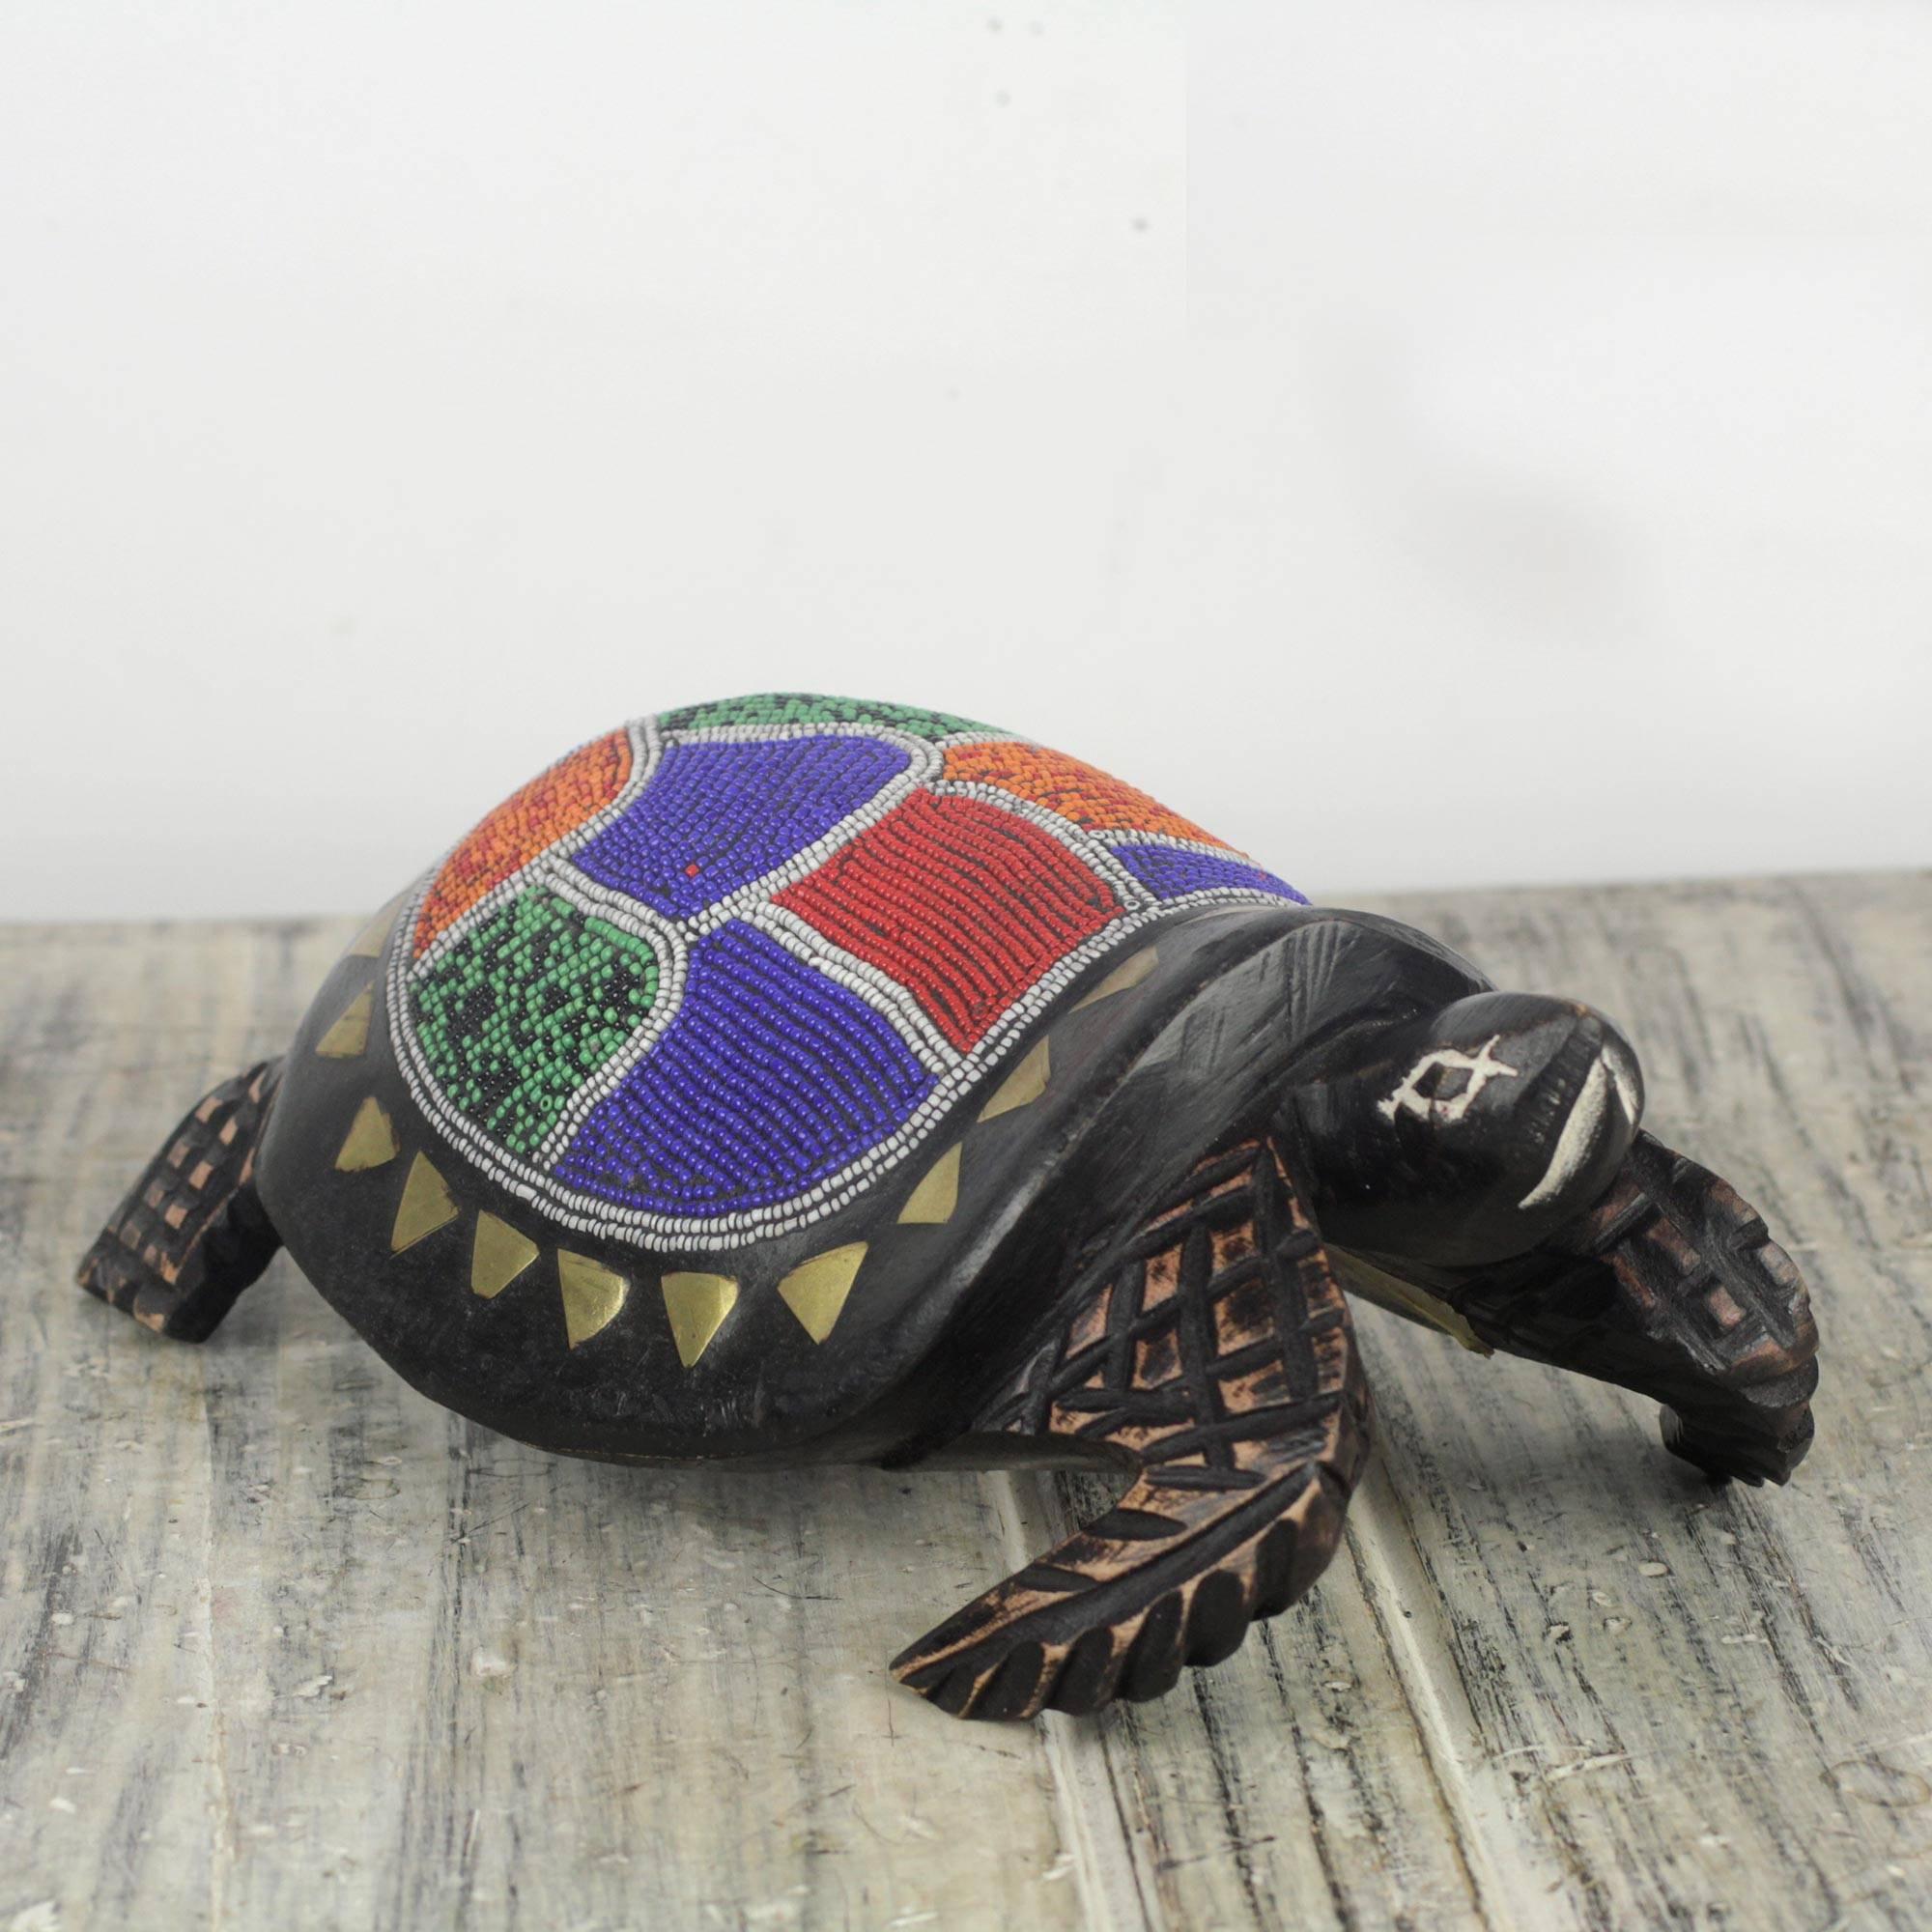 Queen Turtle Colorful Beaded Turtle Sculpture Handmade in Ghana